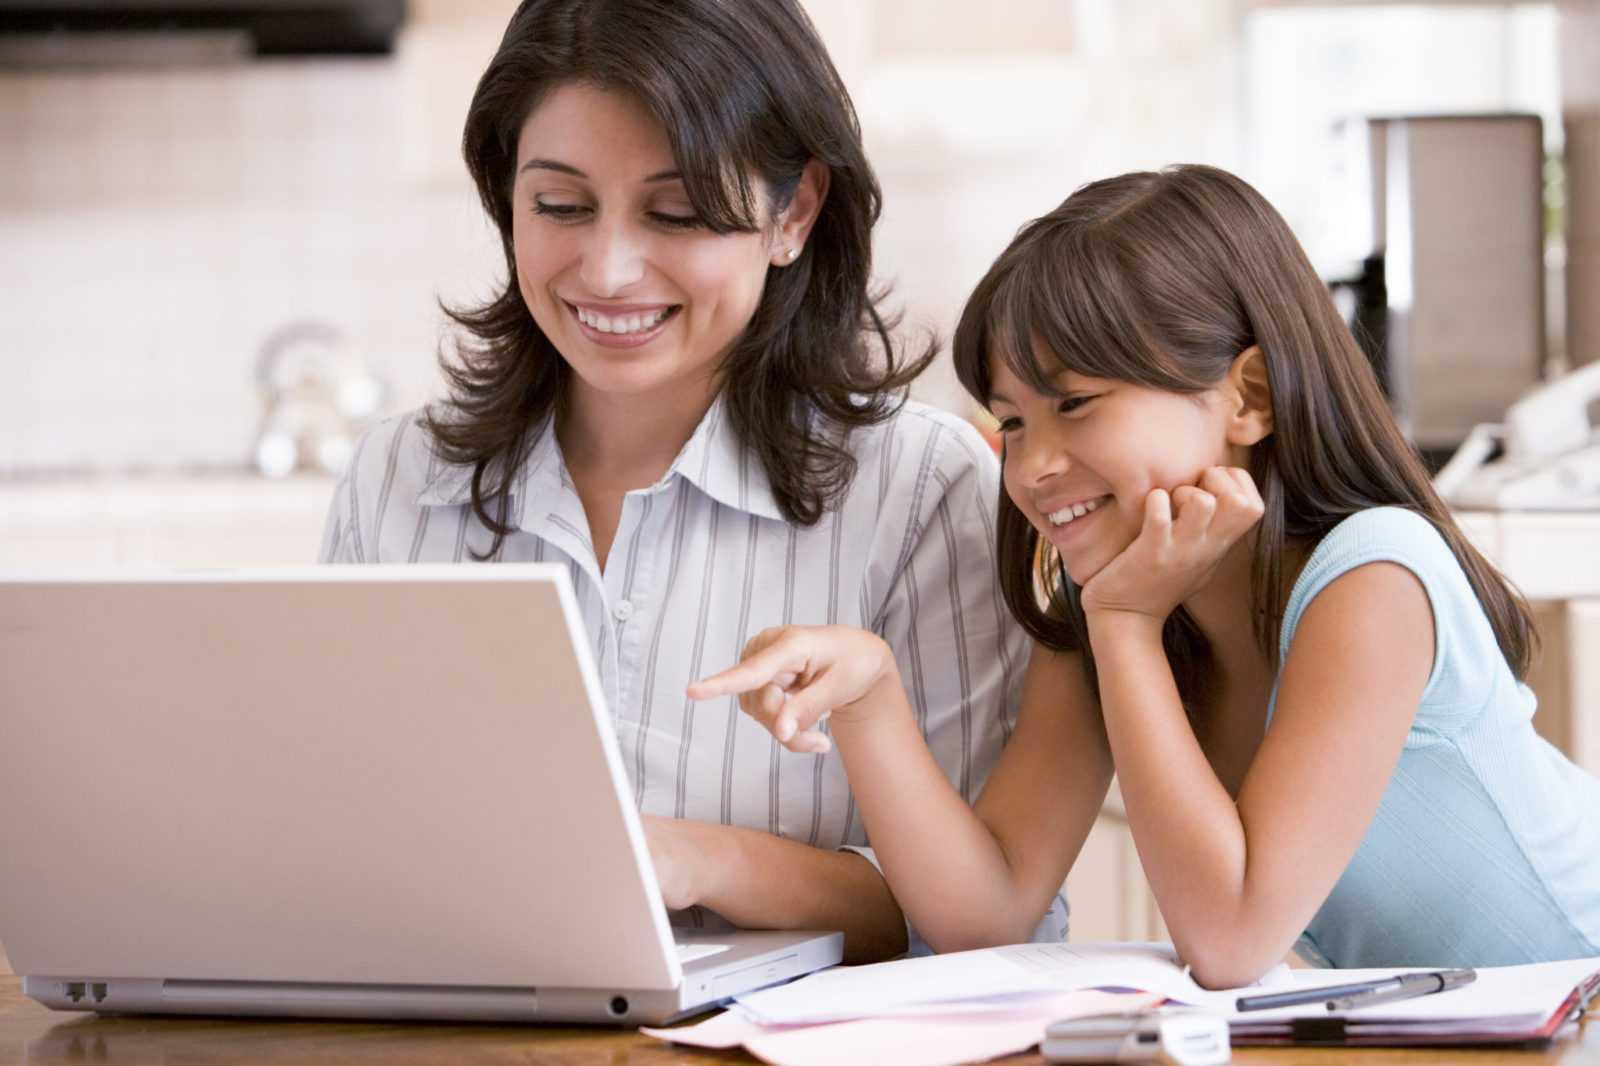 The Zeeko Top 5 Internet Safety Tips to Mark Safer Internet